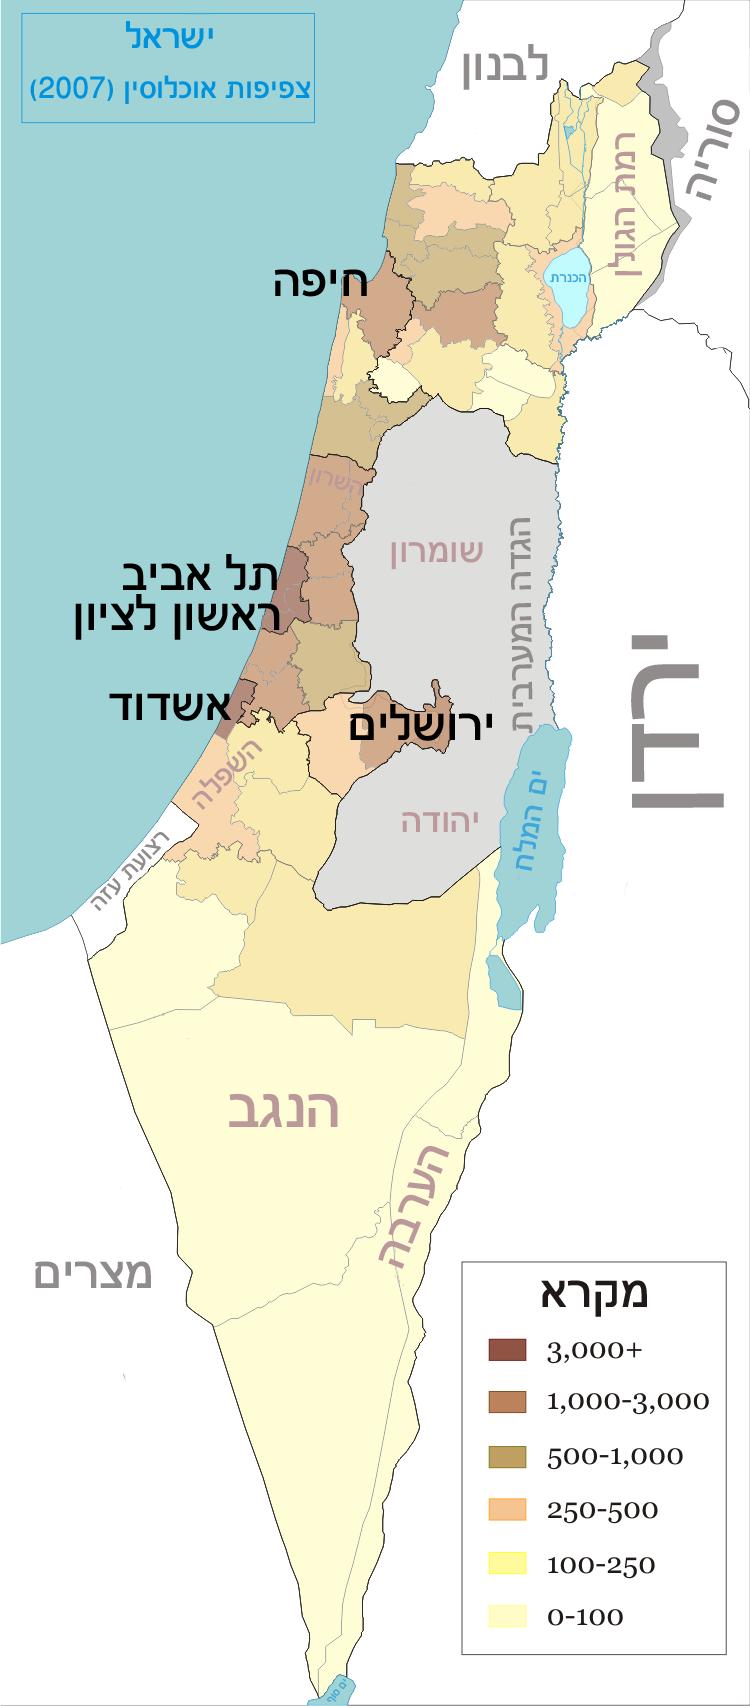 Israel population density he